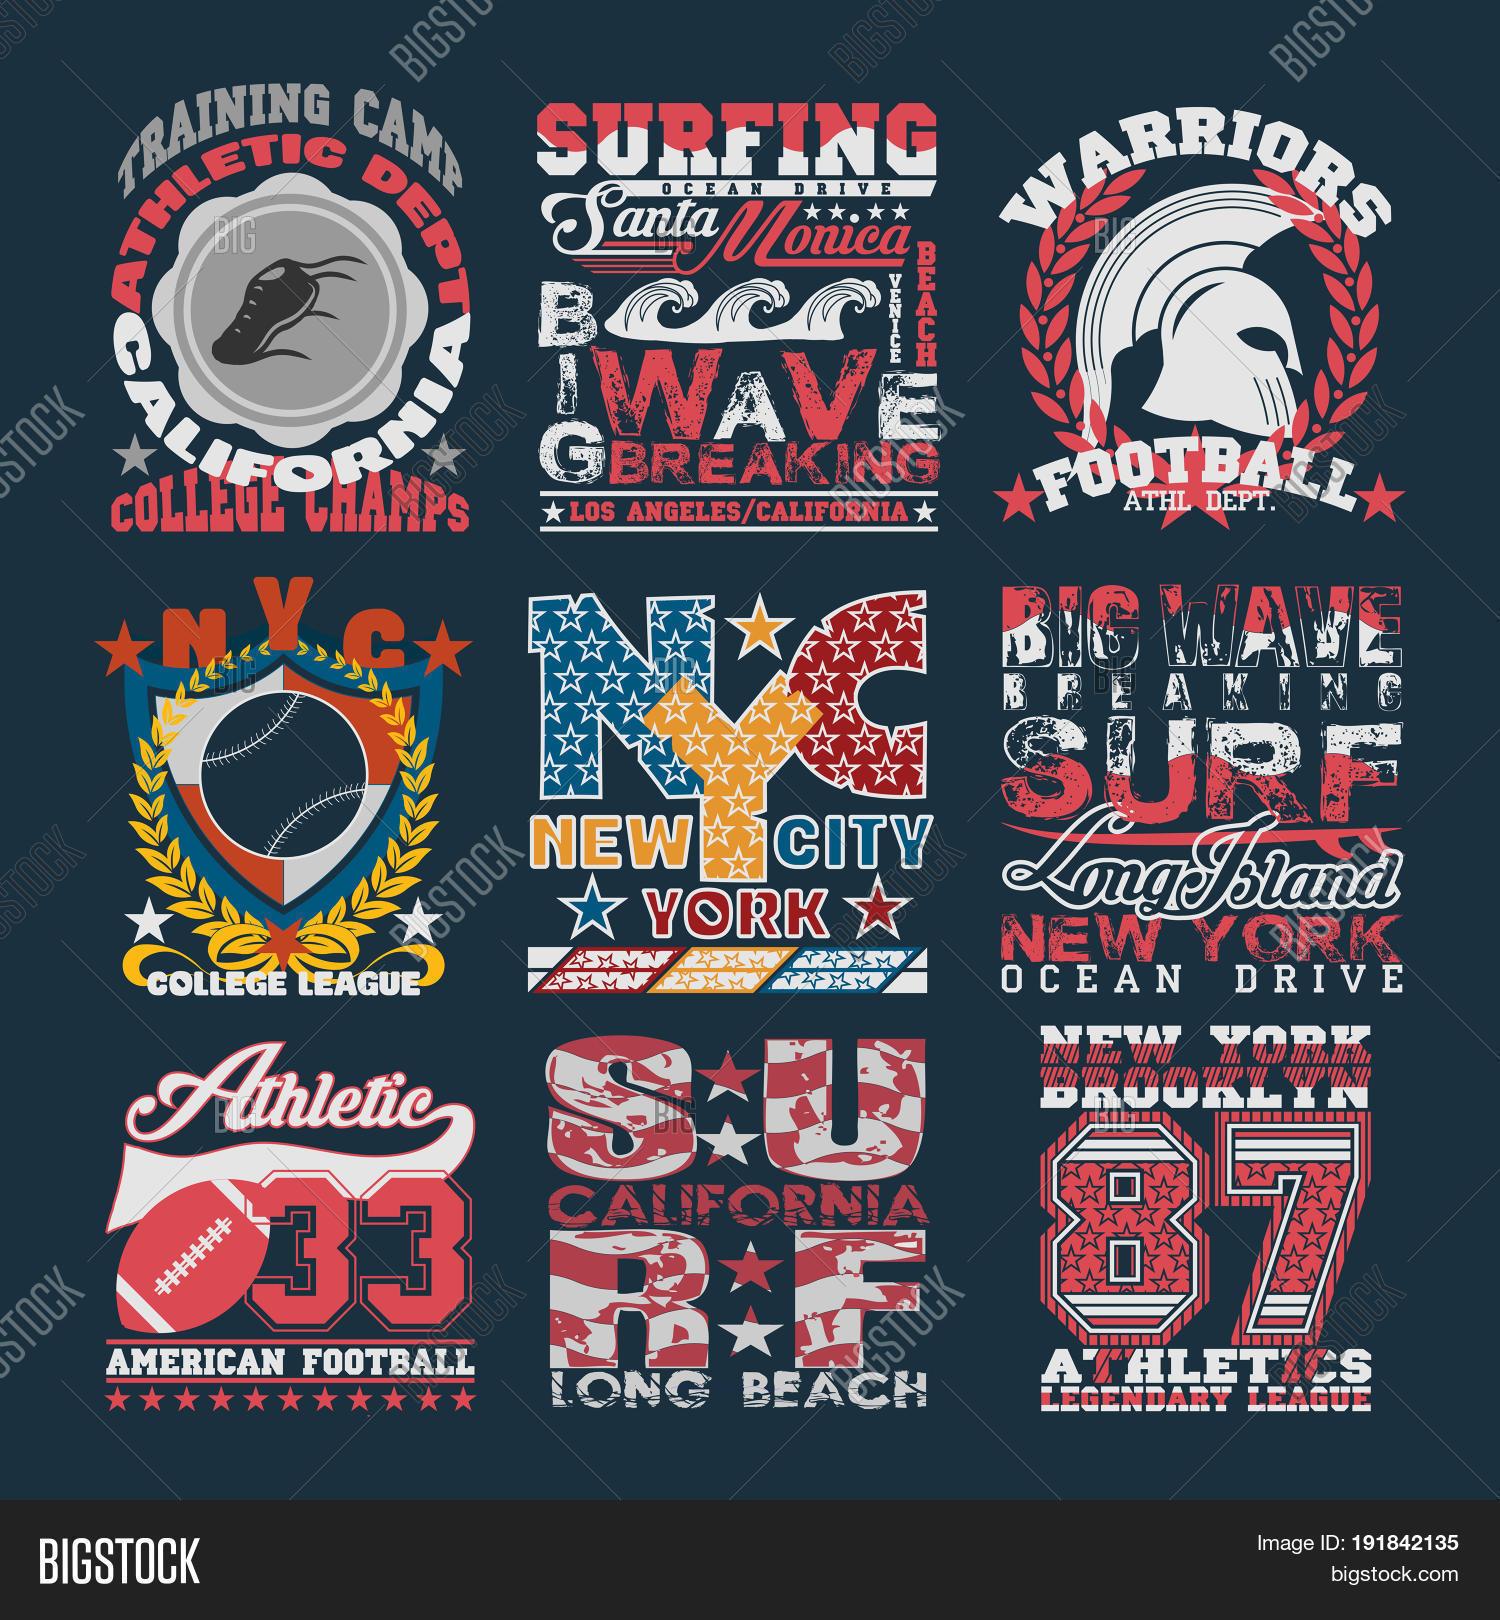 ce8f8f9d3 Sport Typography Graphics emblem set T-shirt Printing Designs. Athletic  original Vintage Prints for